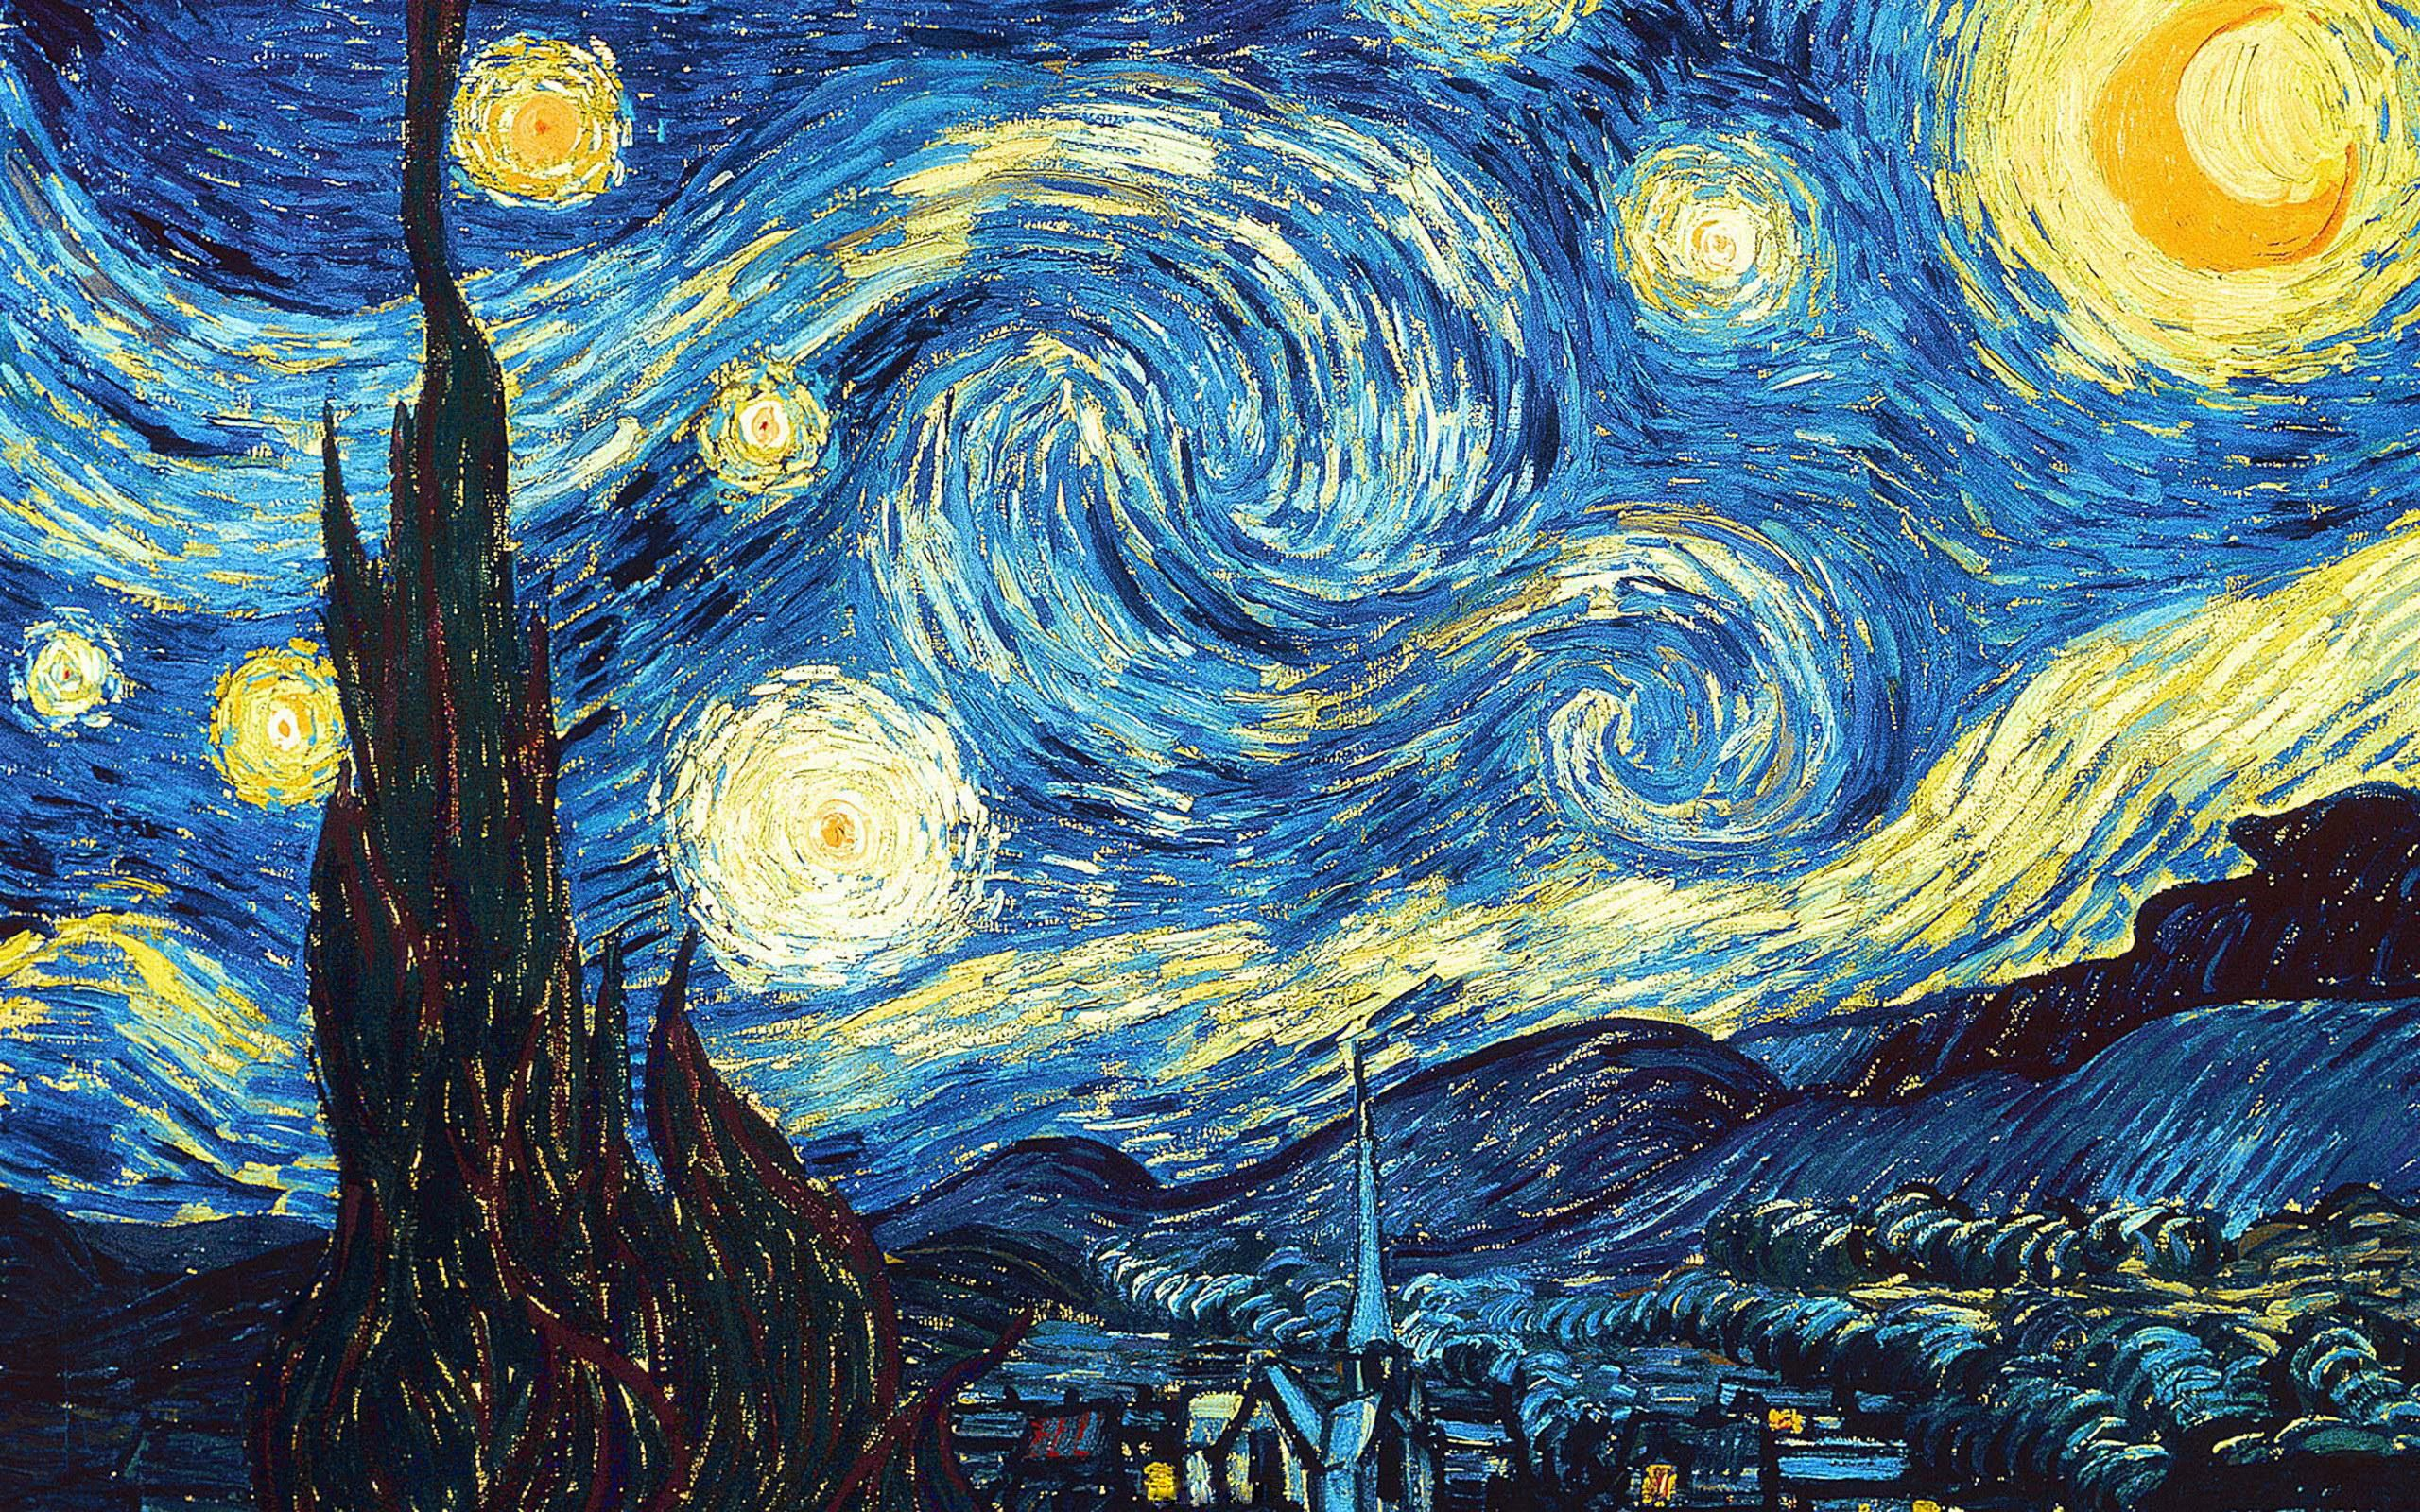 Noite Estrelada Van Gogh Wallpaper Pesquisa Google Quadros De